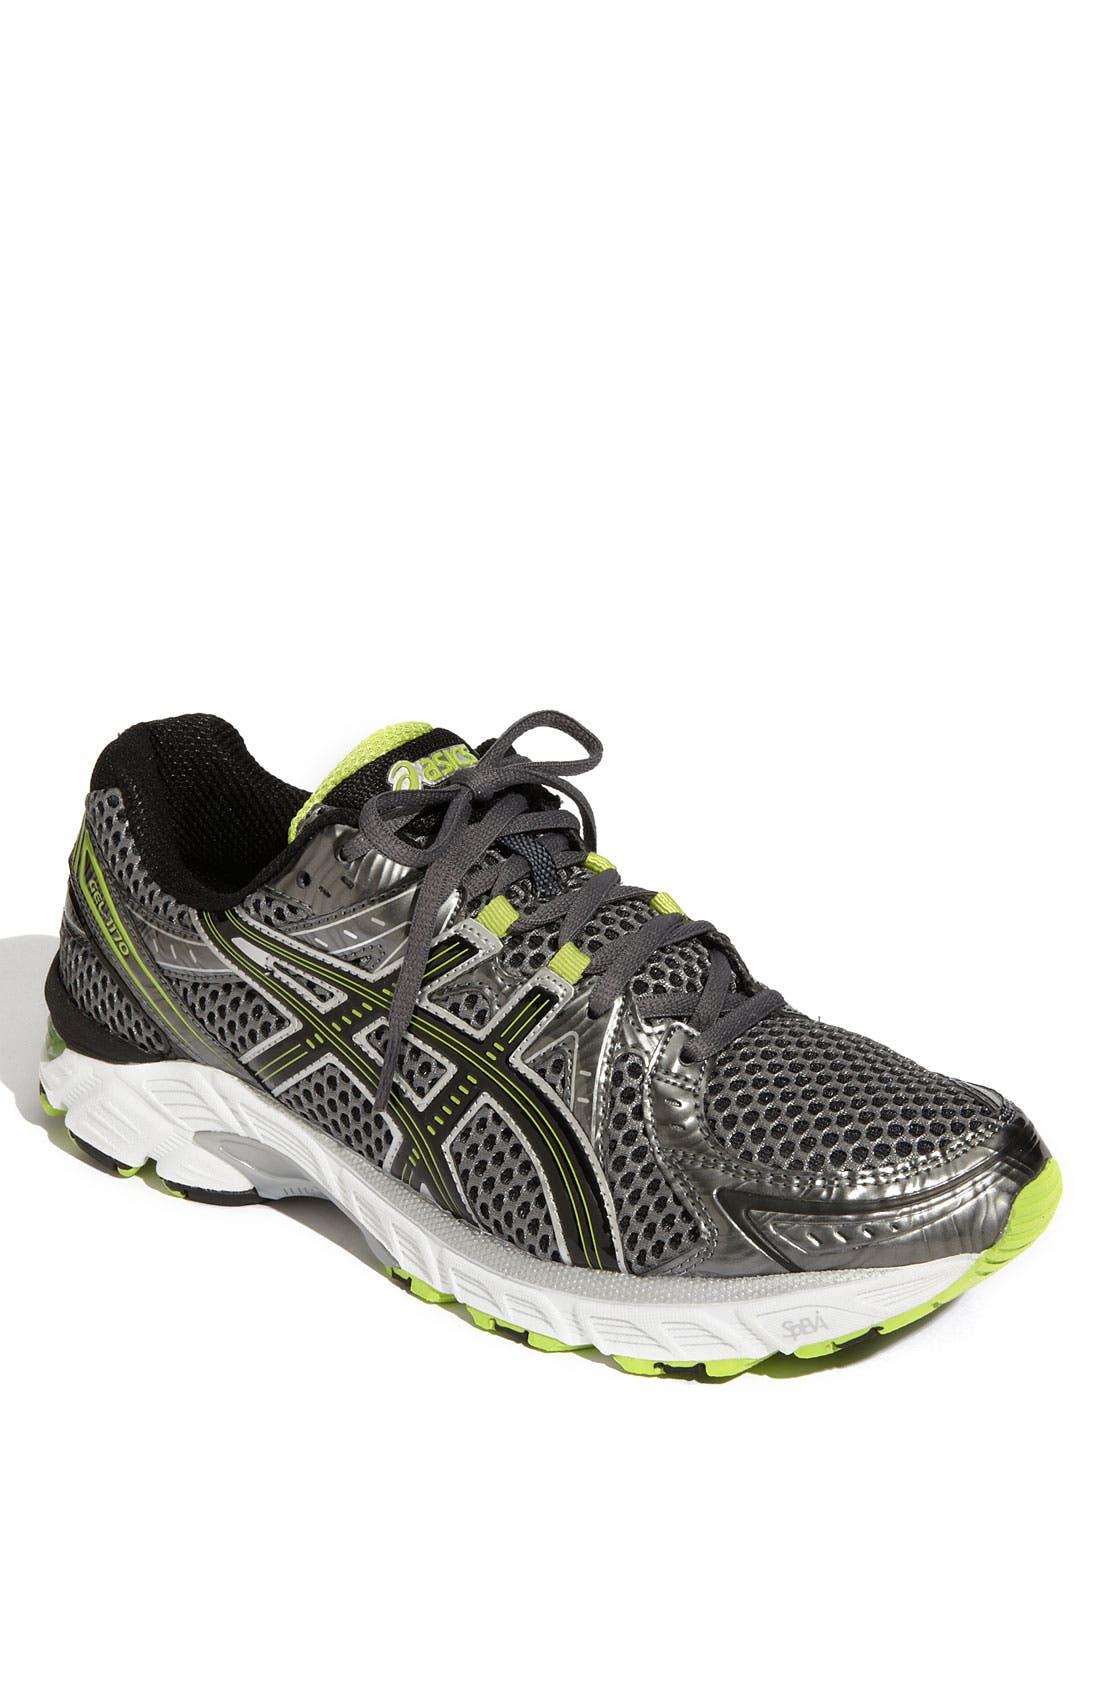 Alternate Image 1 Selected - ASICS® 'Gel-1170™' Running Shoe (Men)